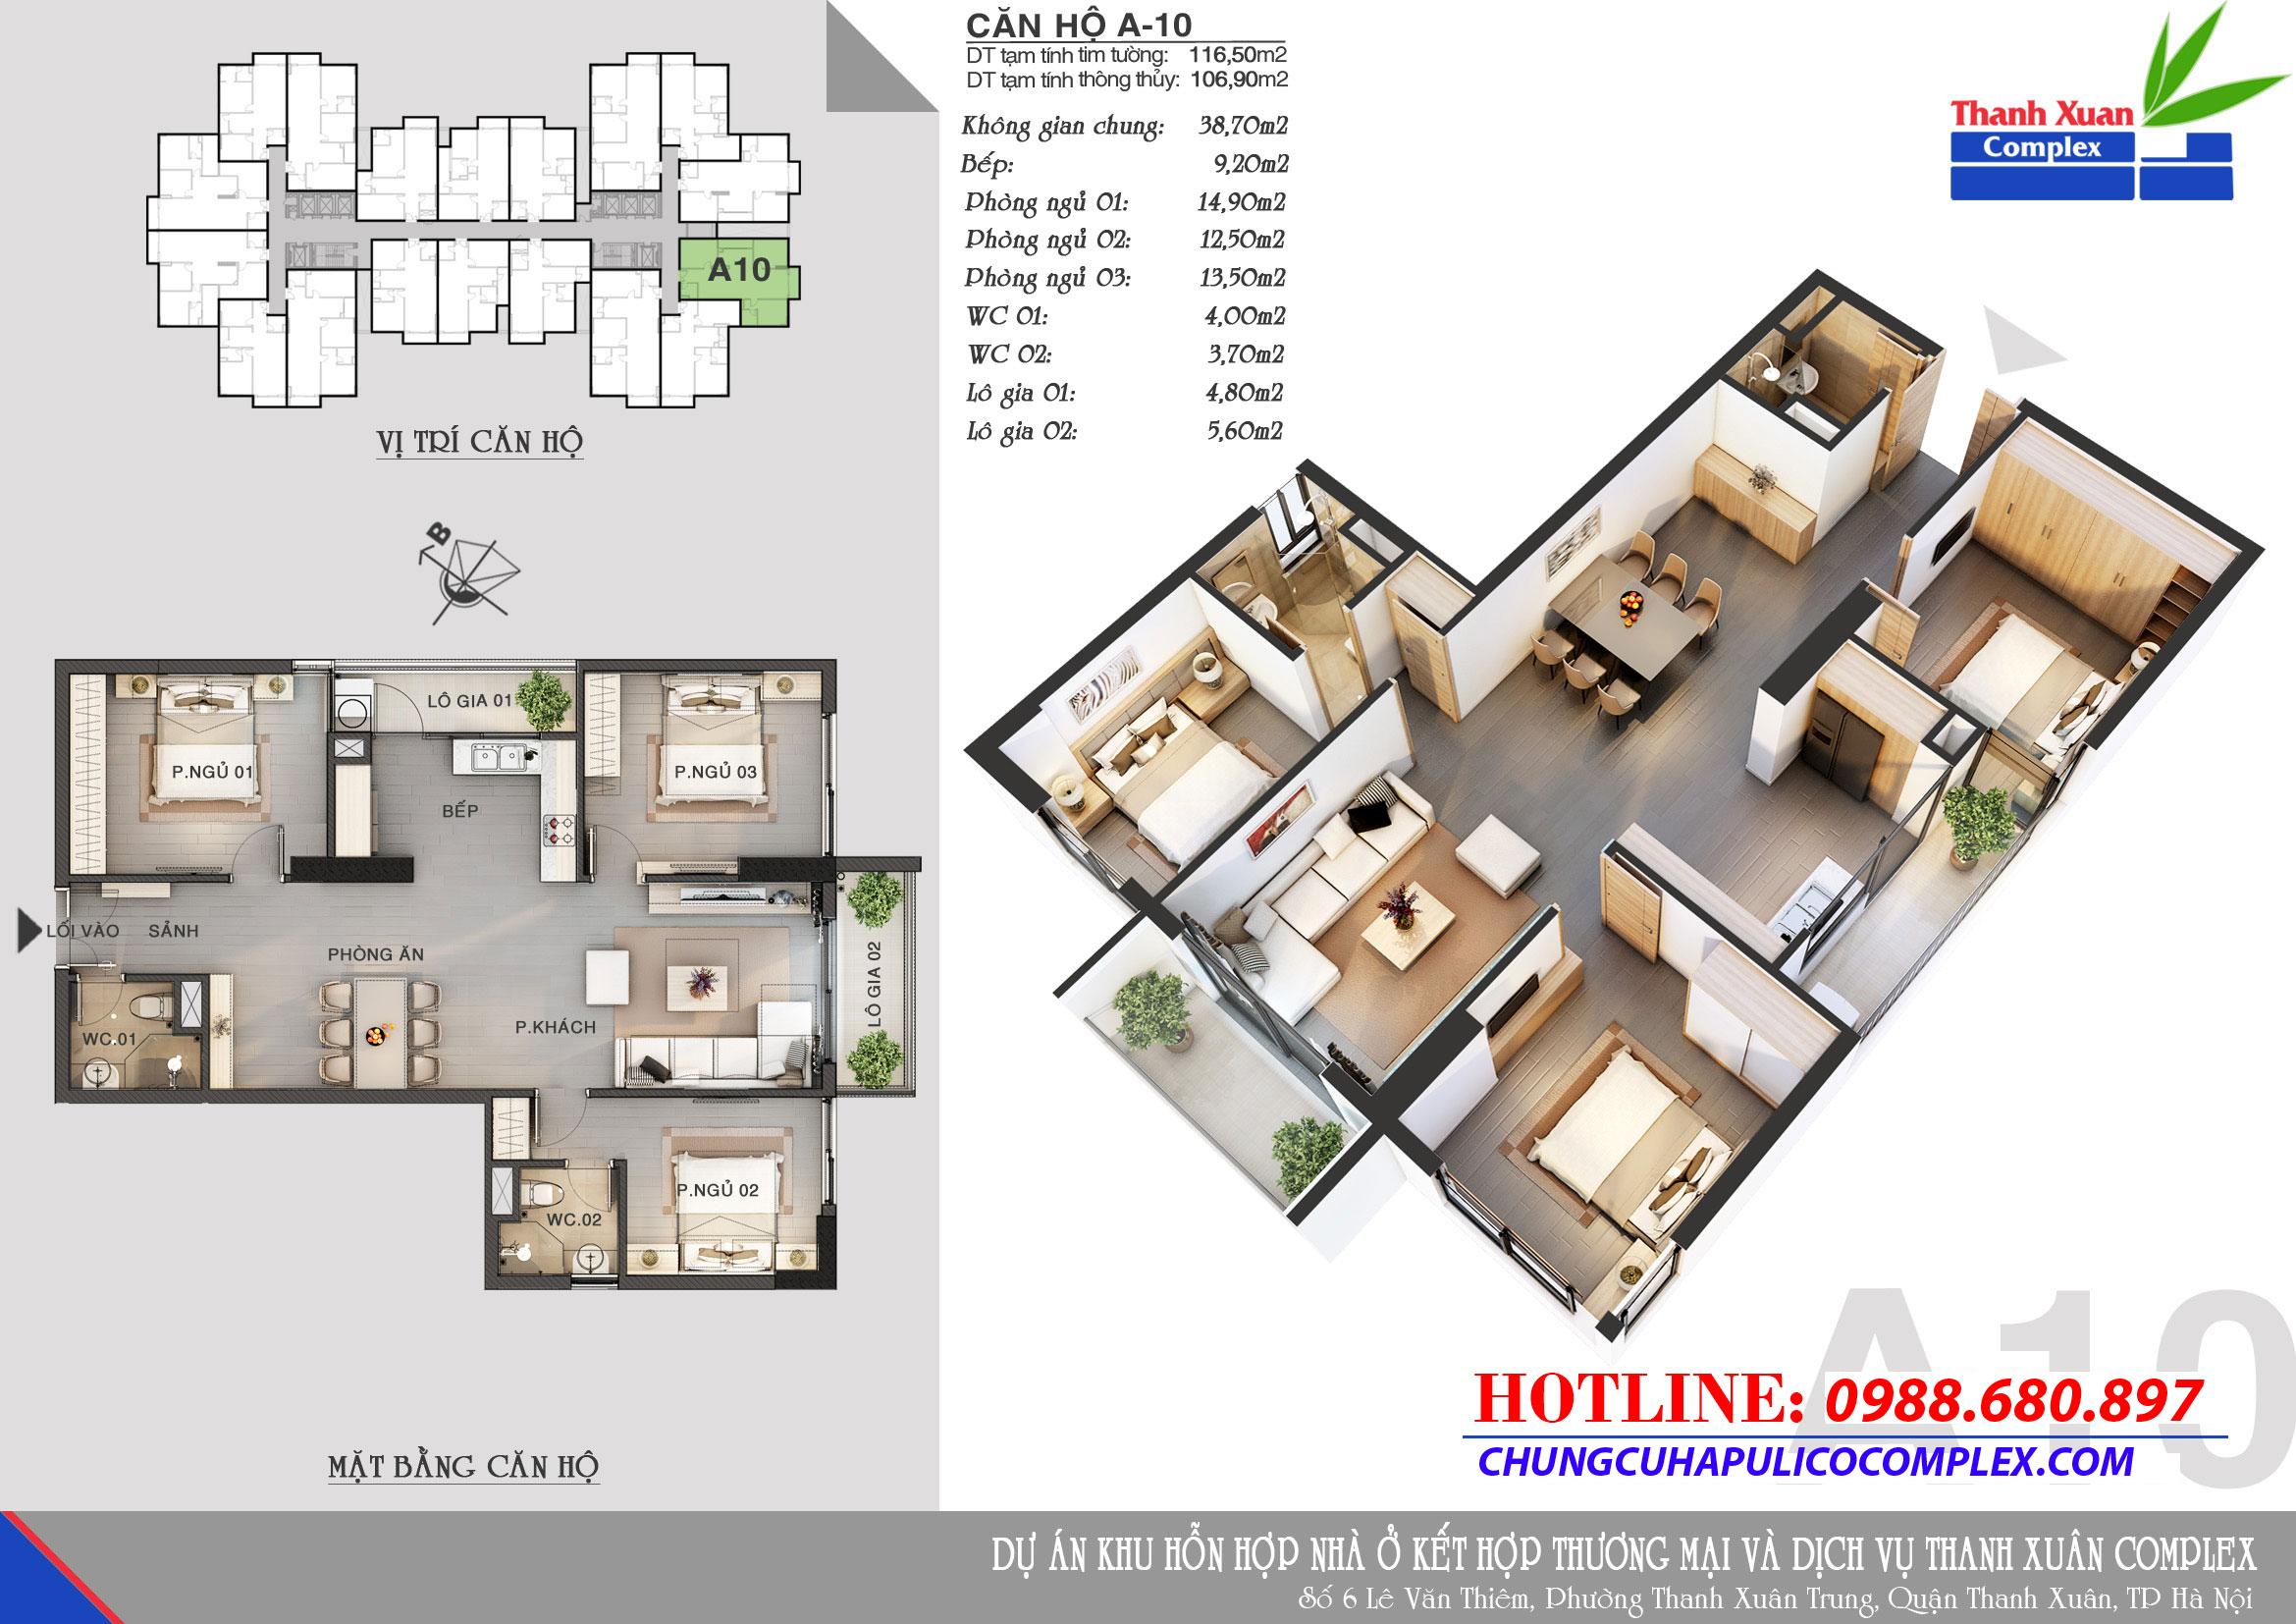 HSB_Thanhxuan-complex_CH-A10_suachotT42016-copy